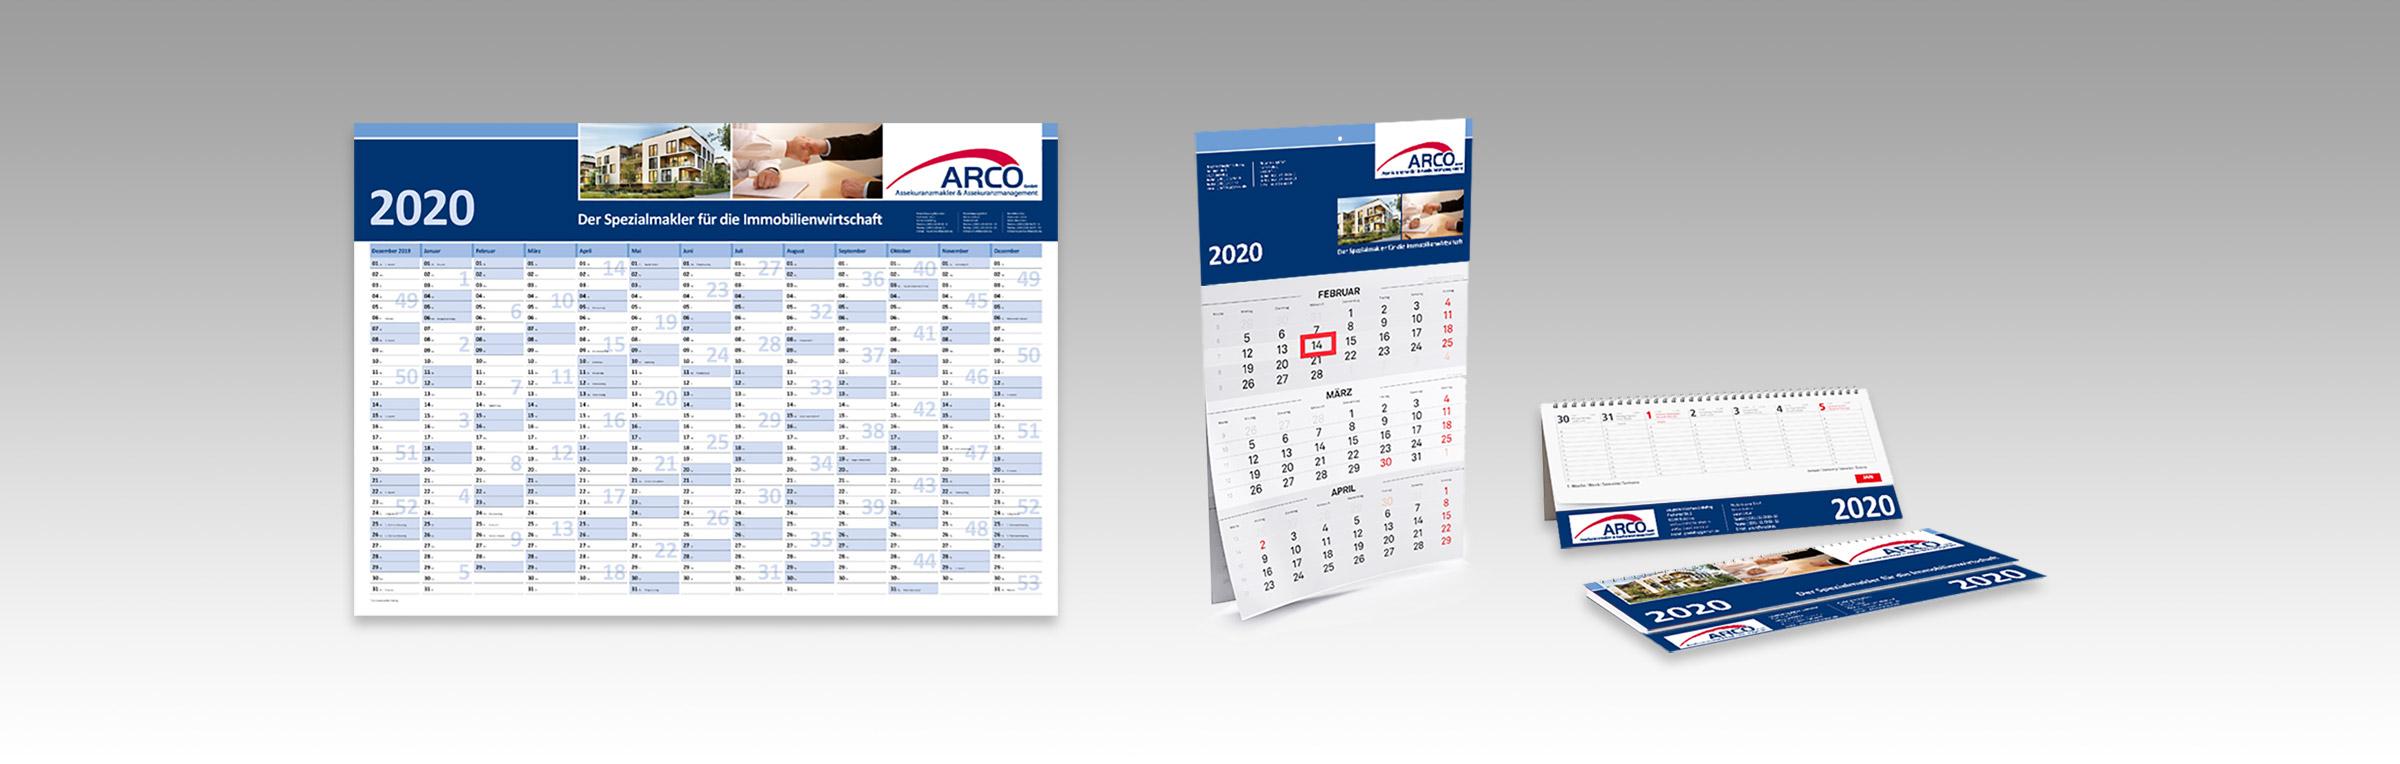 Arco Kalender 2020